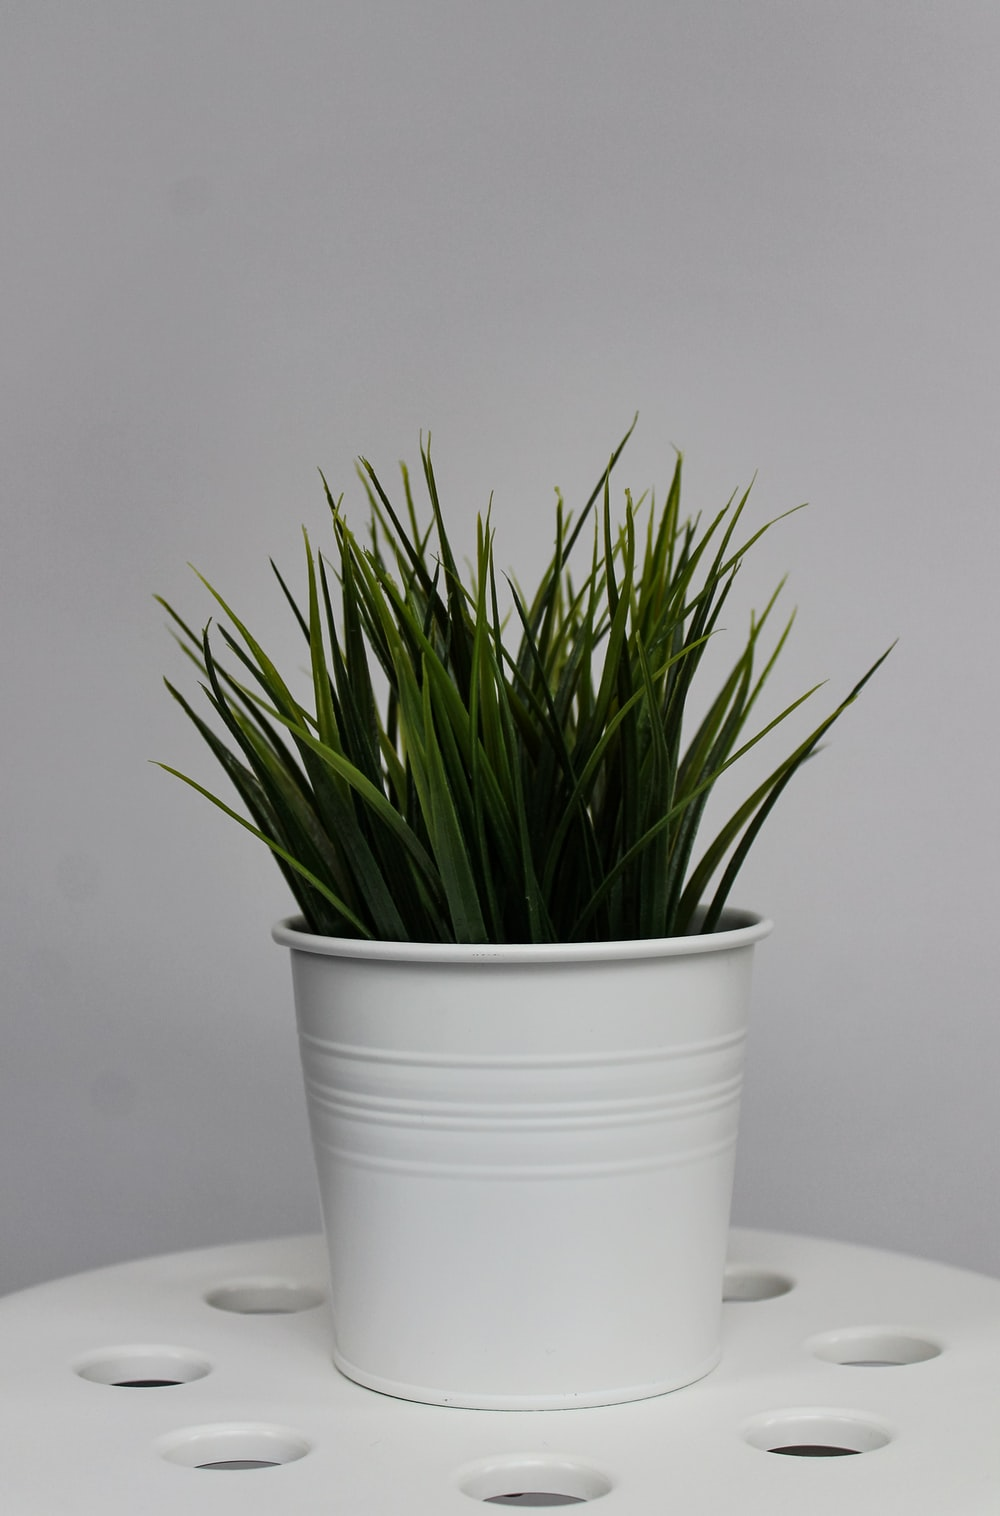 green-leafed plant on white flower pot